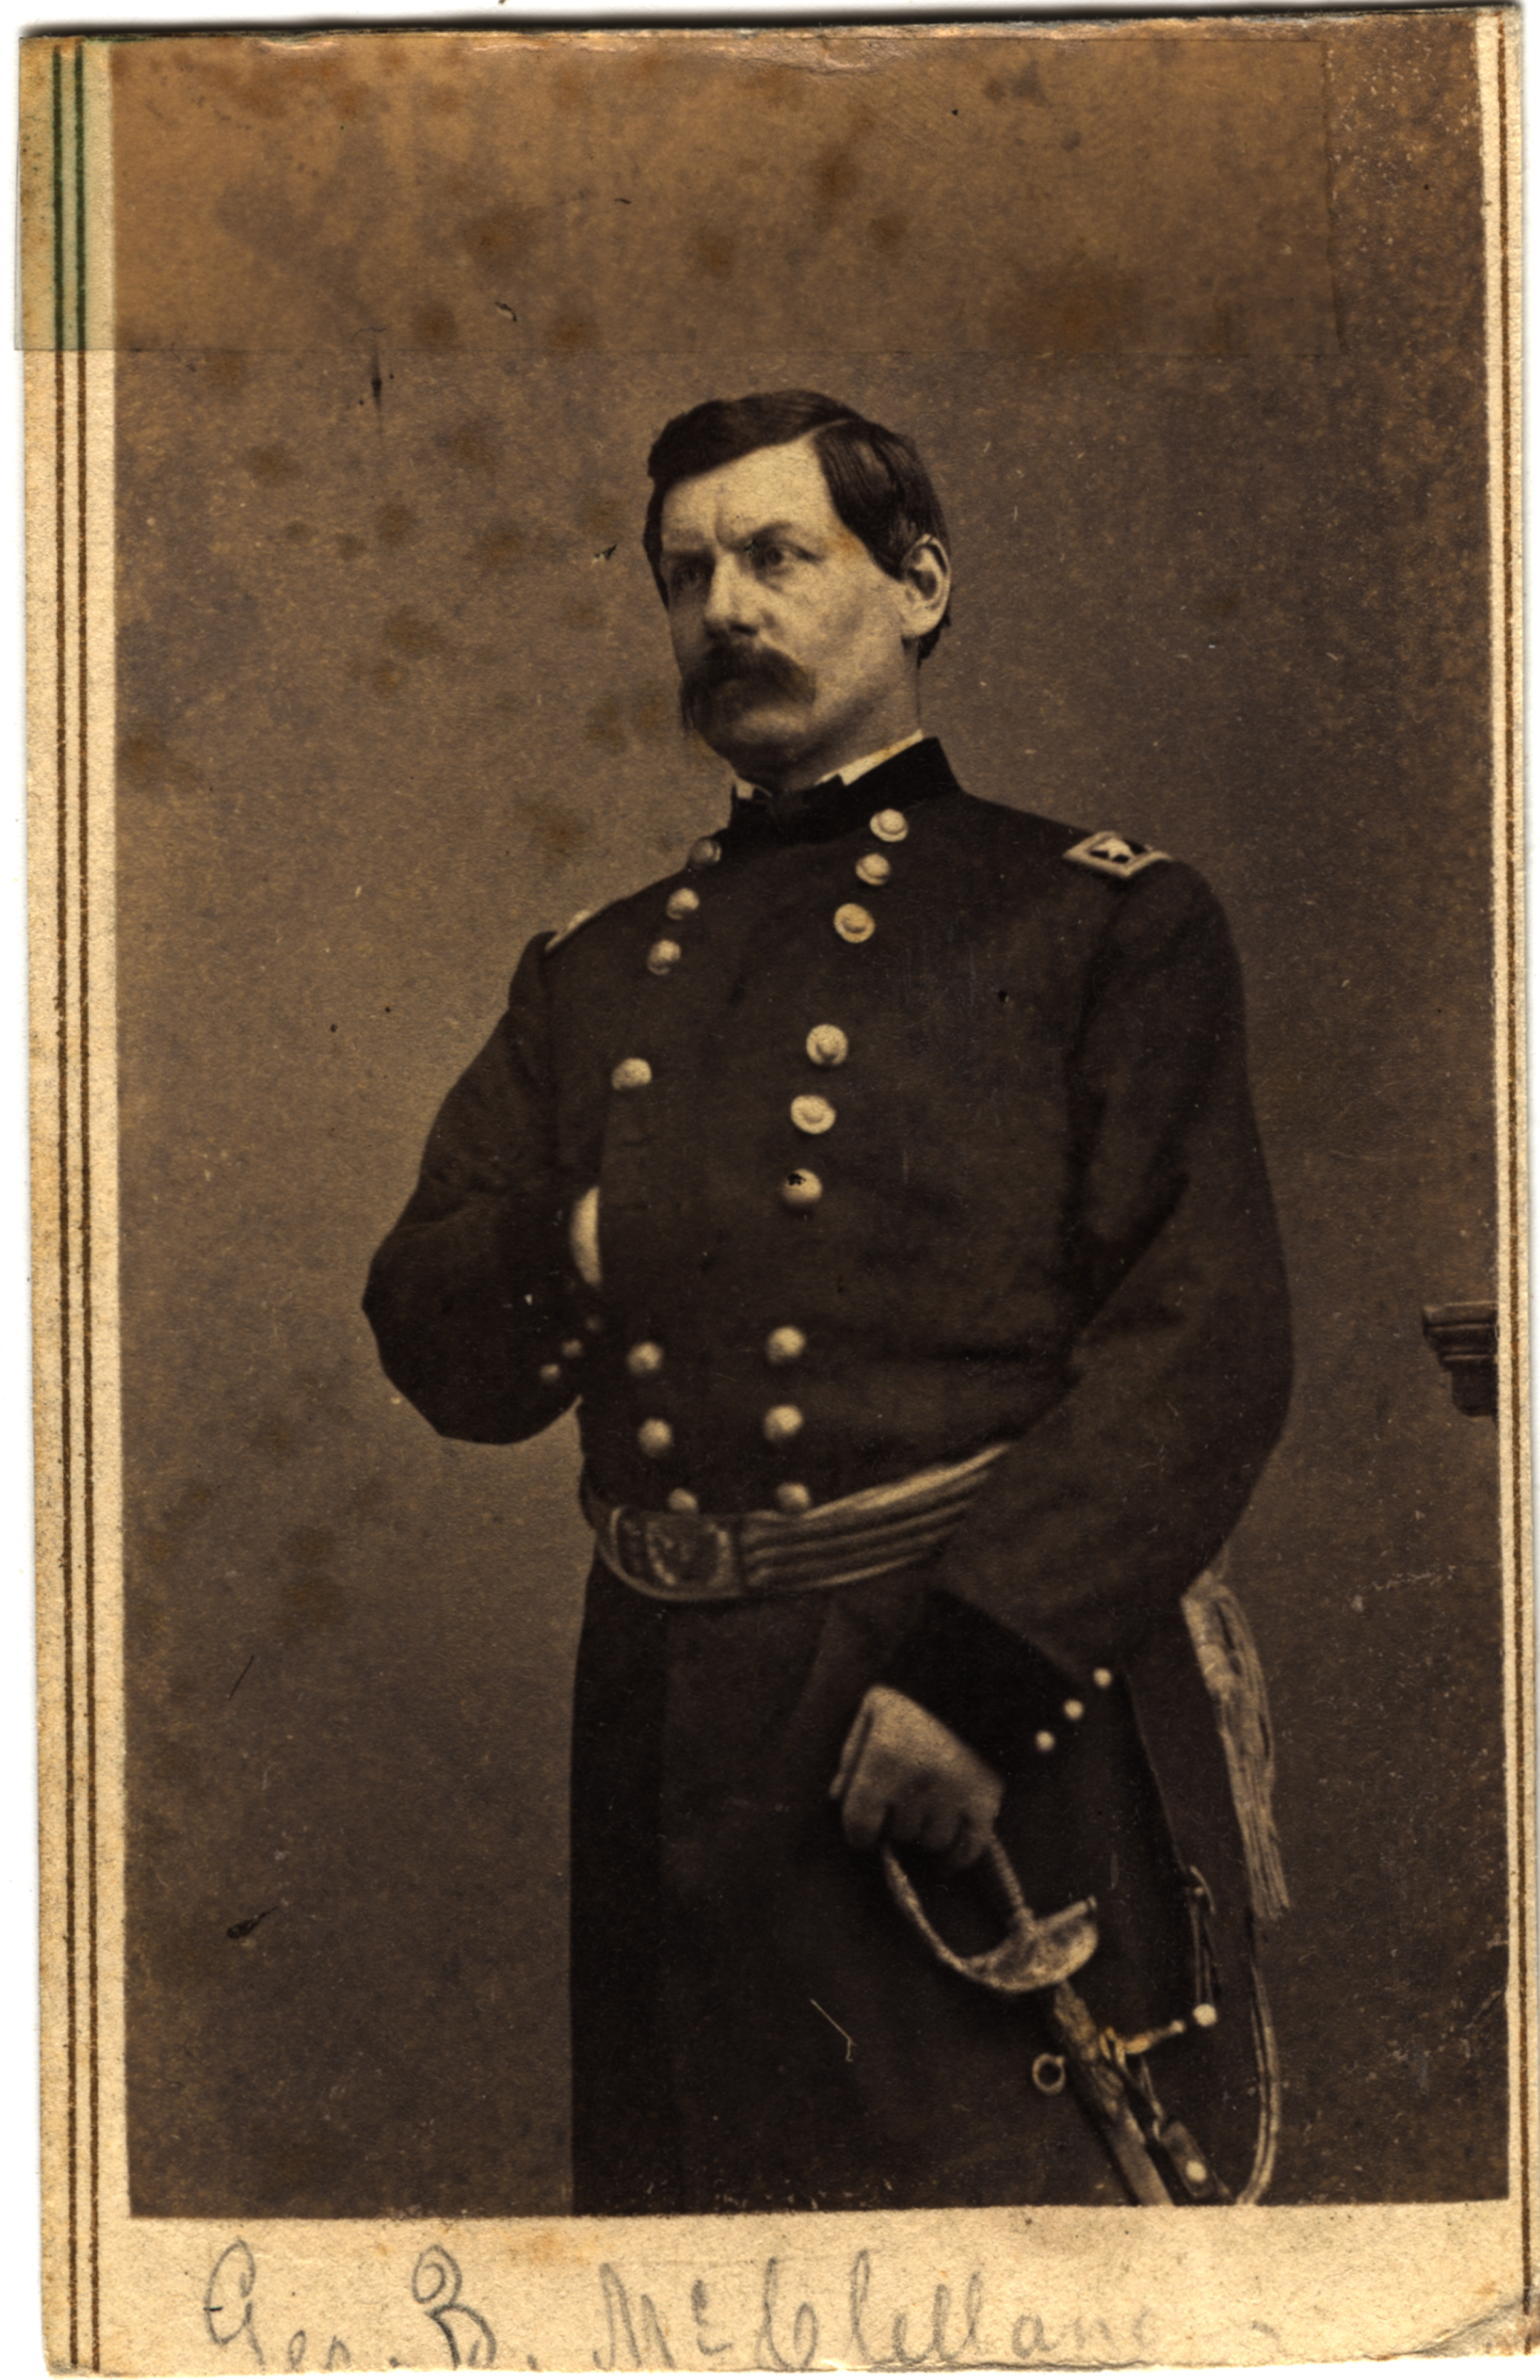 George B. McClellan, circa 1860s